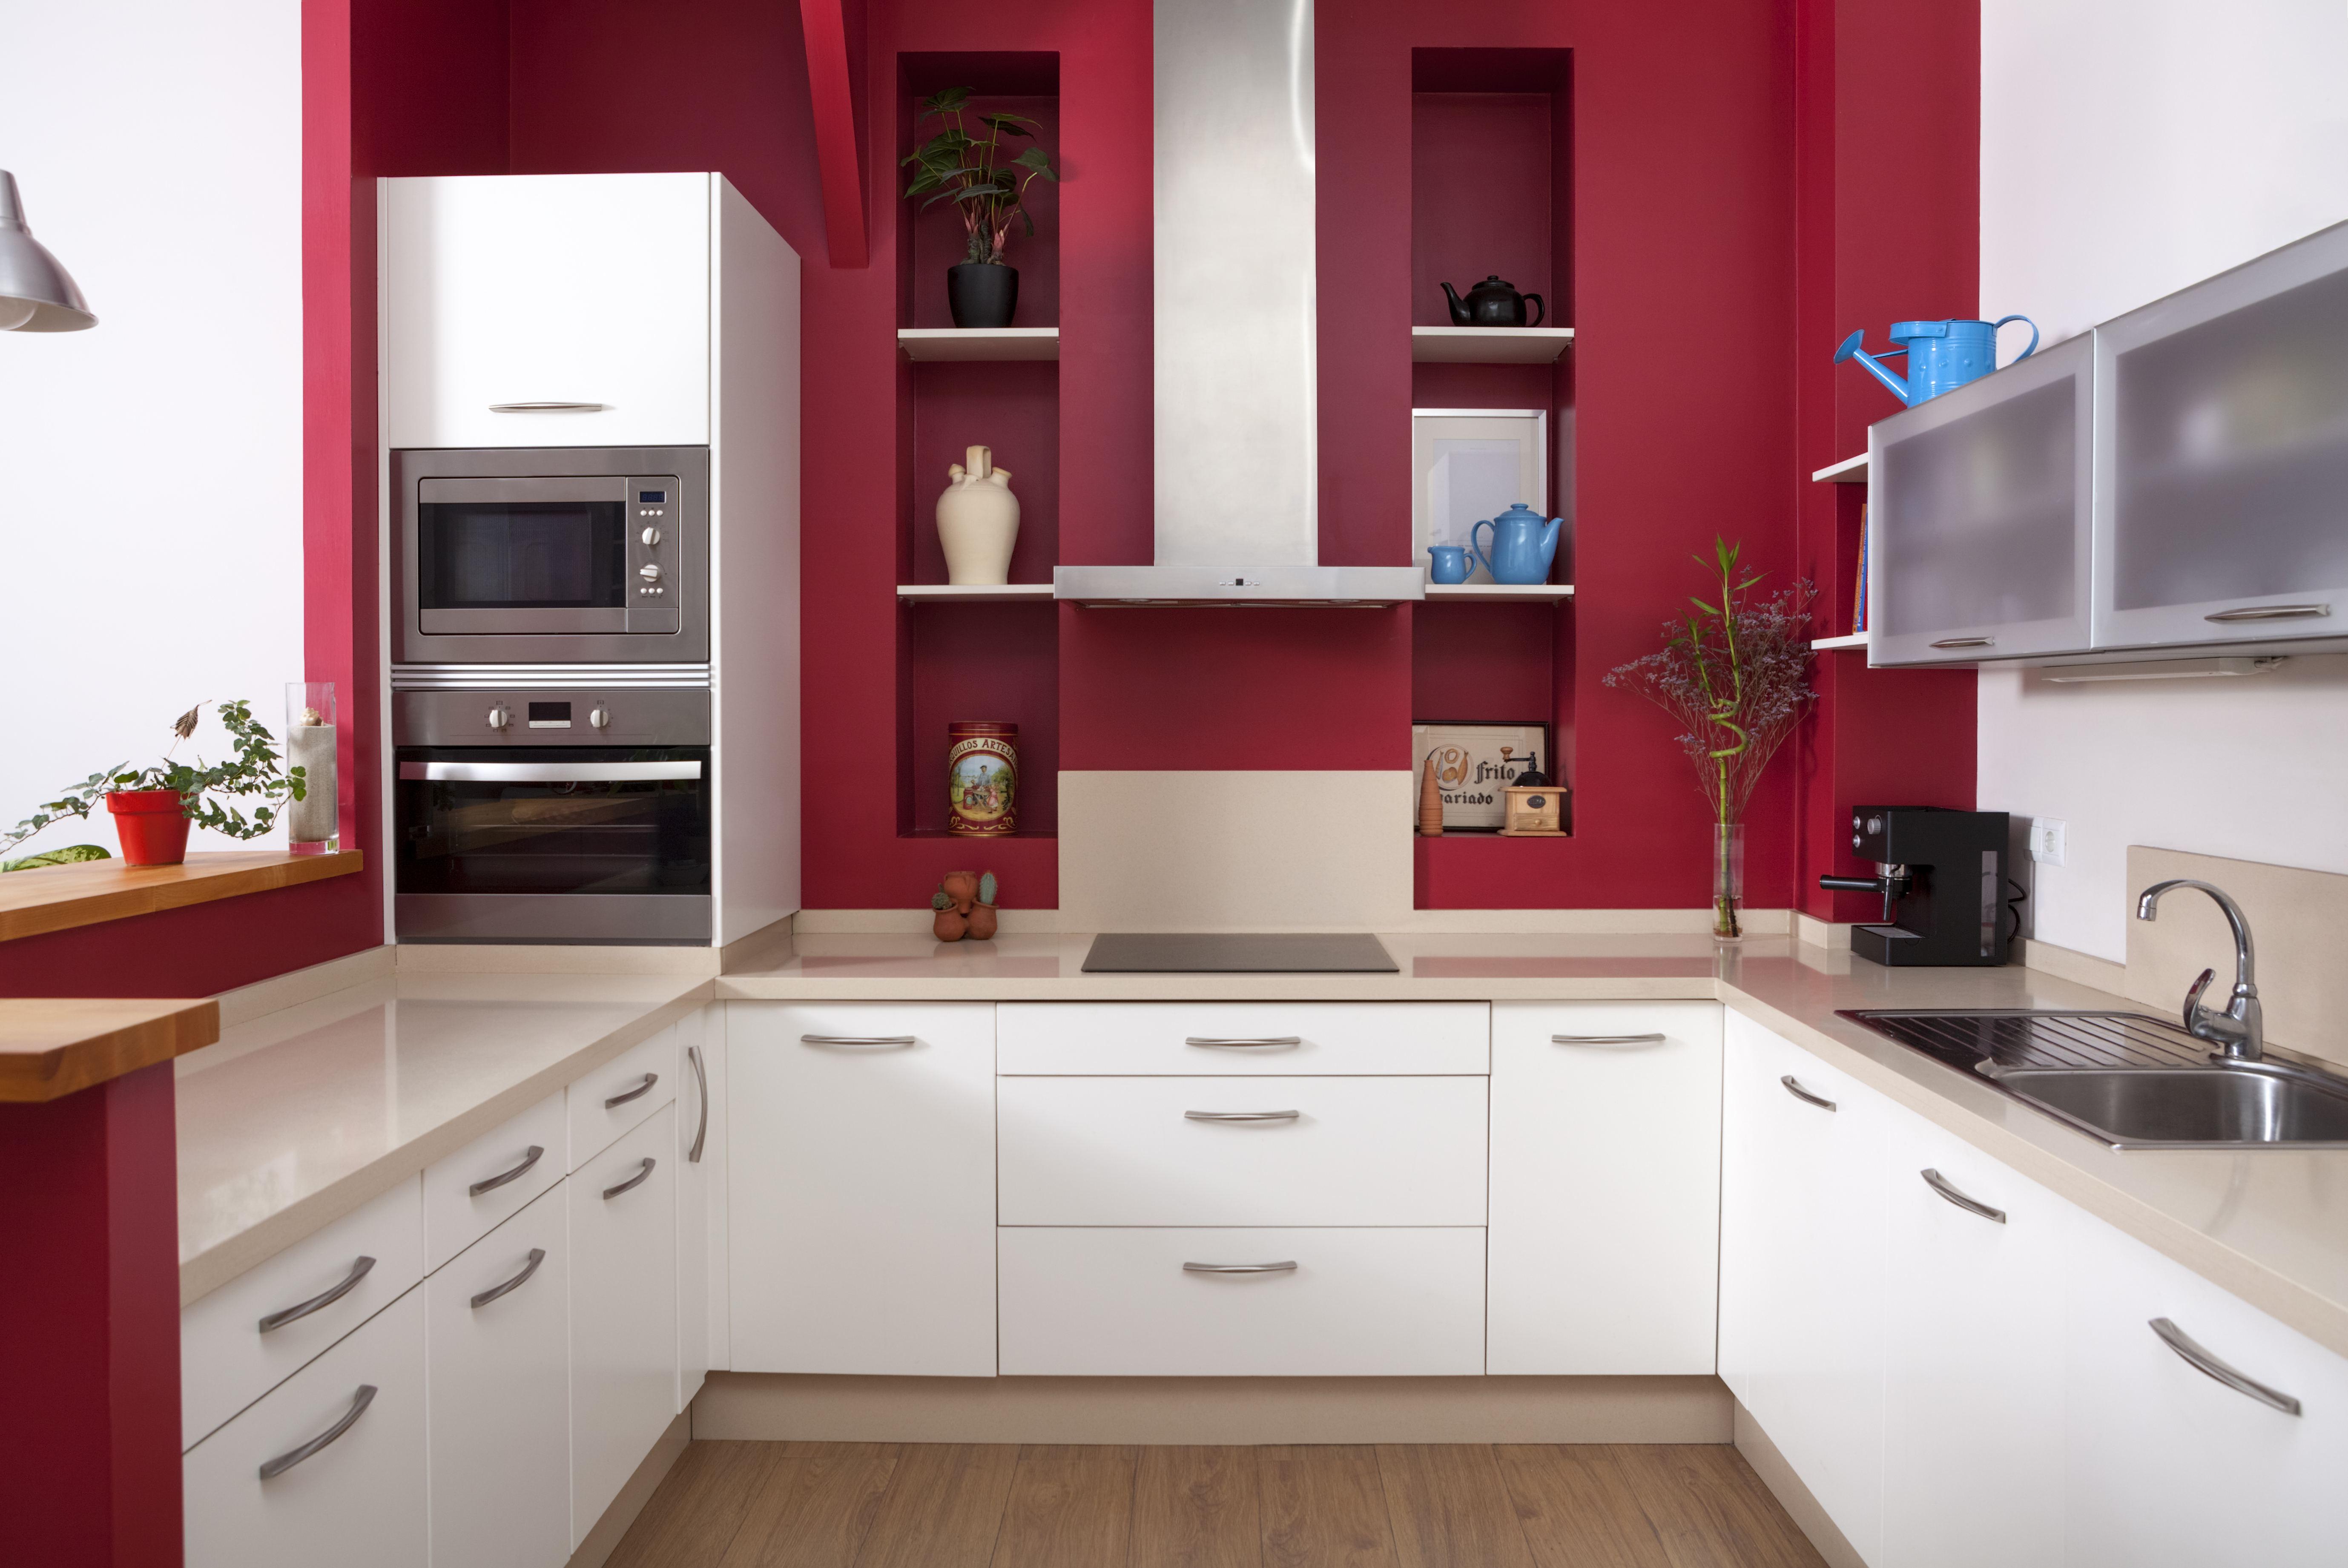 kuchyn_kuchyne_moderni